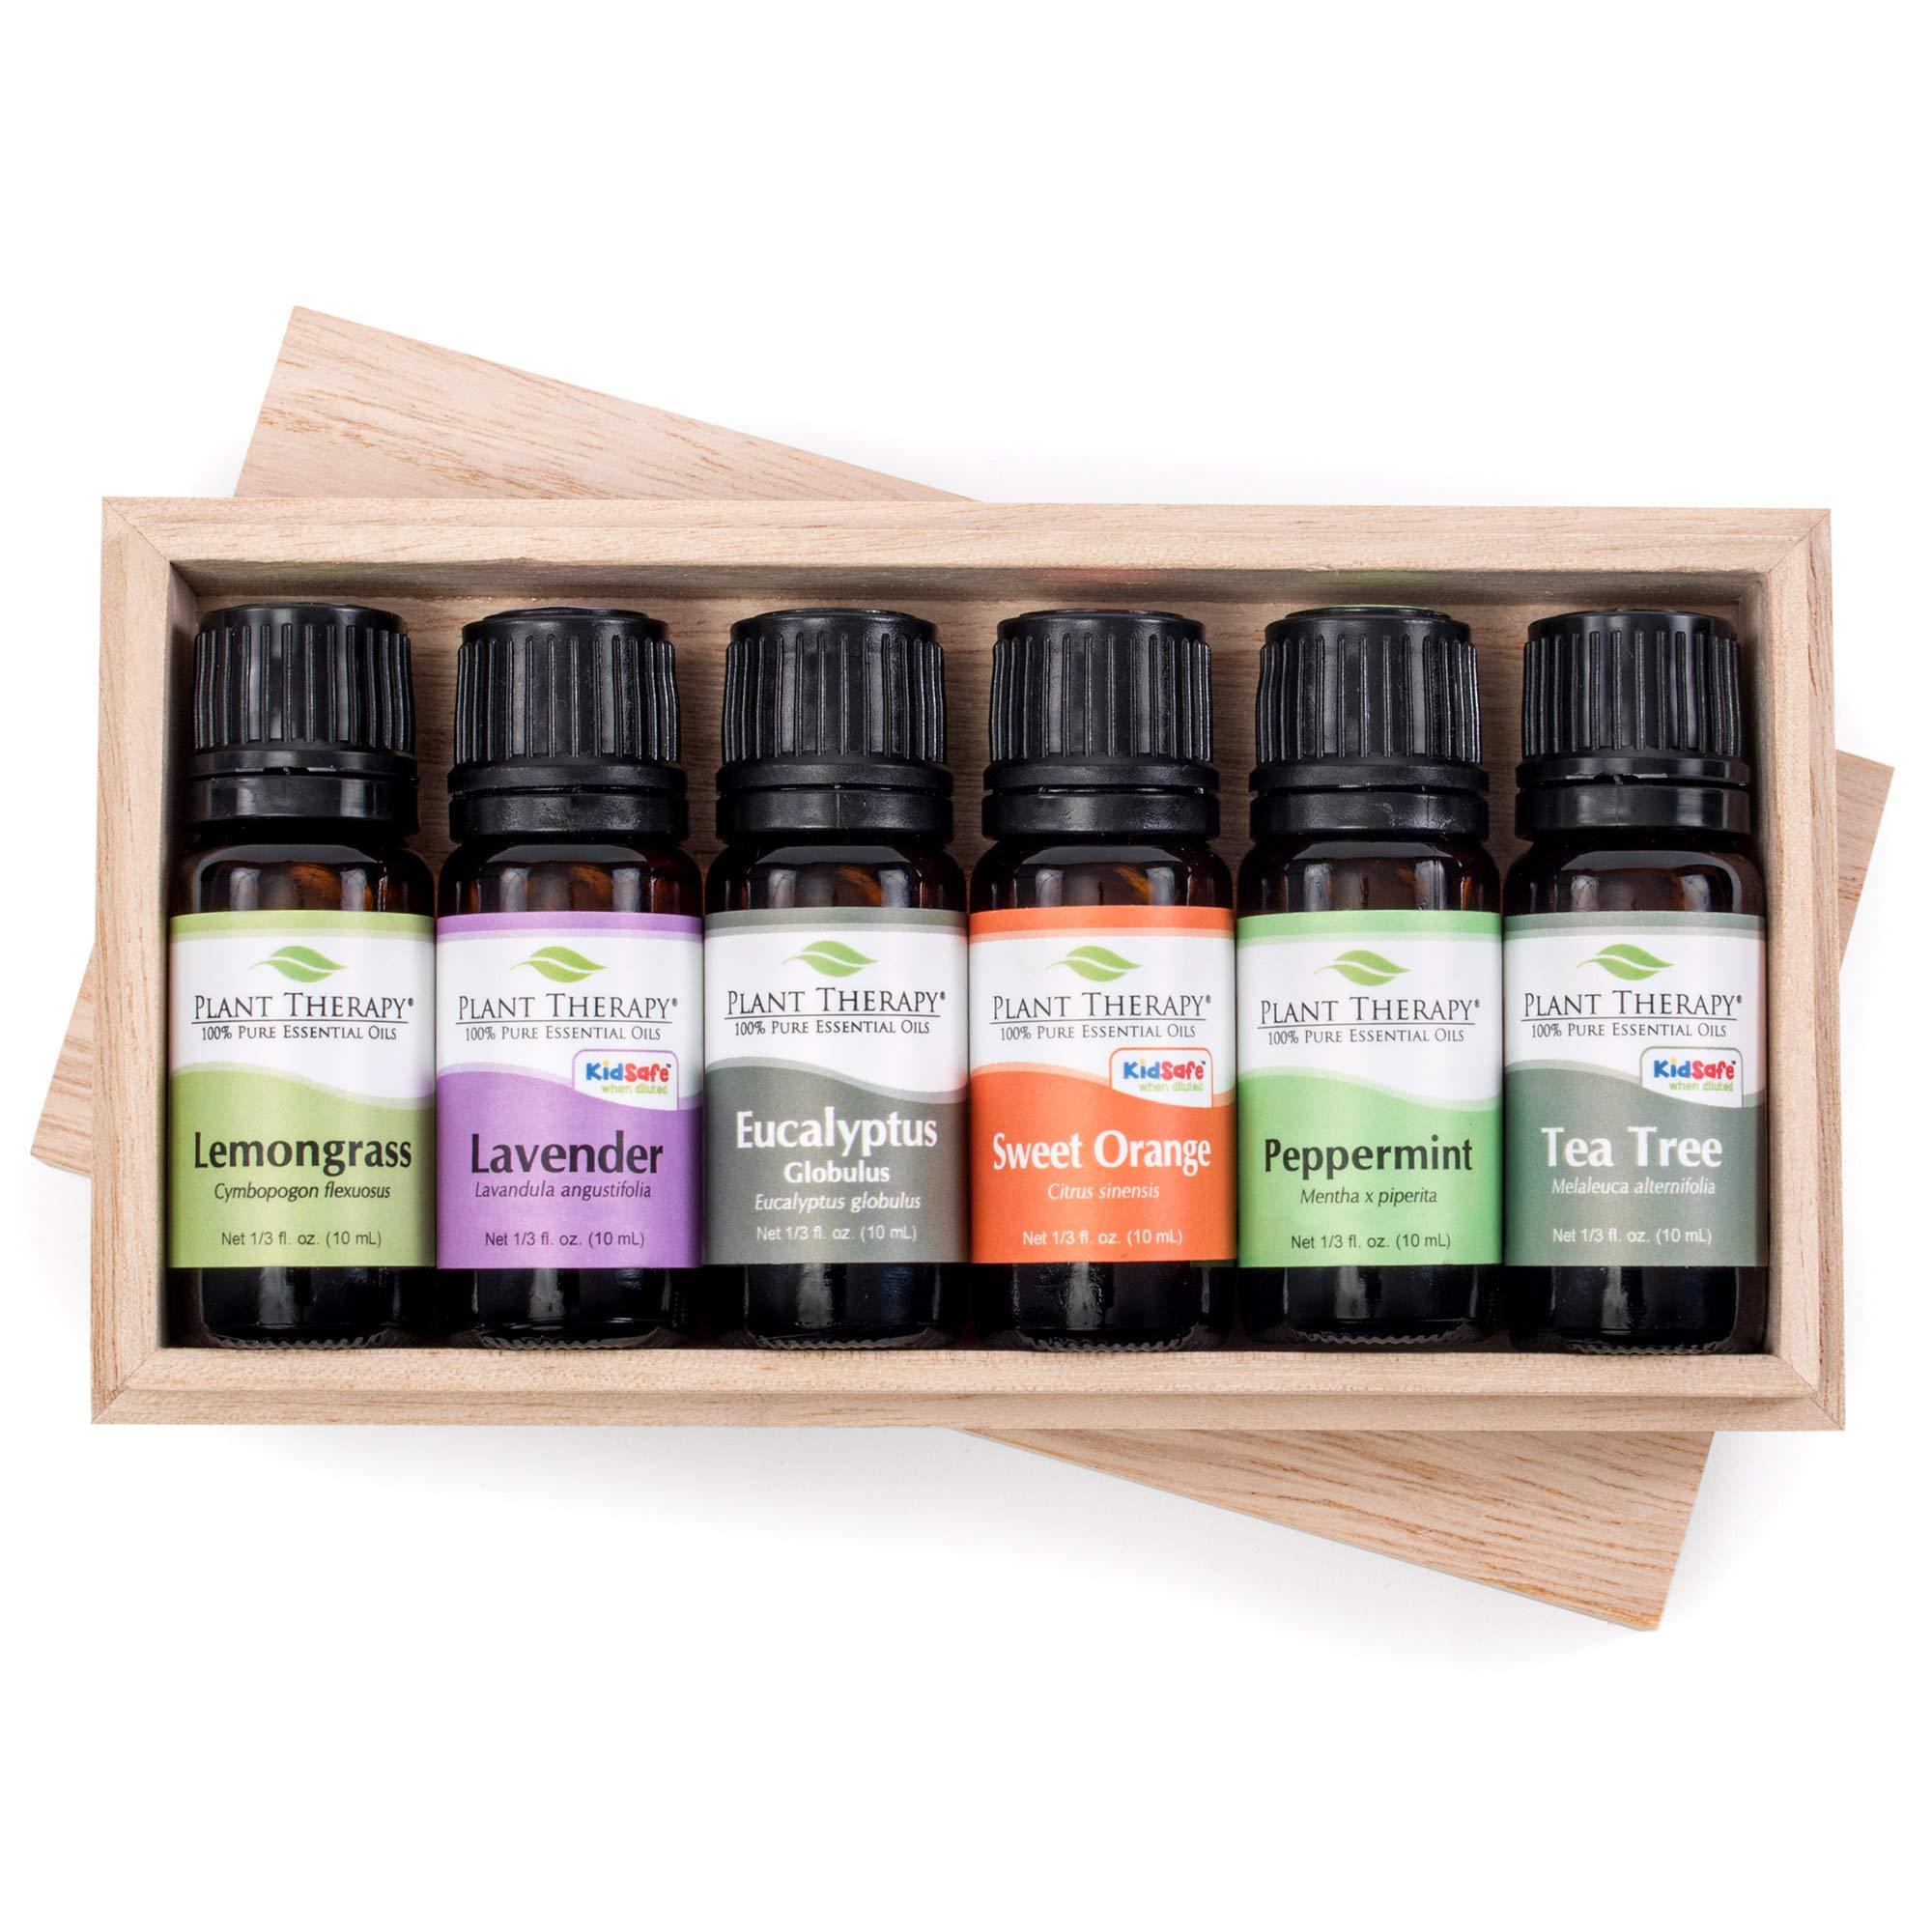 Plant Therapy Breathe Easy Essential Oil Set - Lavender, Eucalyptus, Peppermint, Lemongrass, Orange Sweet, Tea Tree, In A Wooden Box 100% Pure, Aromatherapy, Therapeutic Grade 10 mL (1/3 oz)